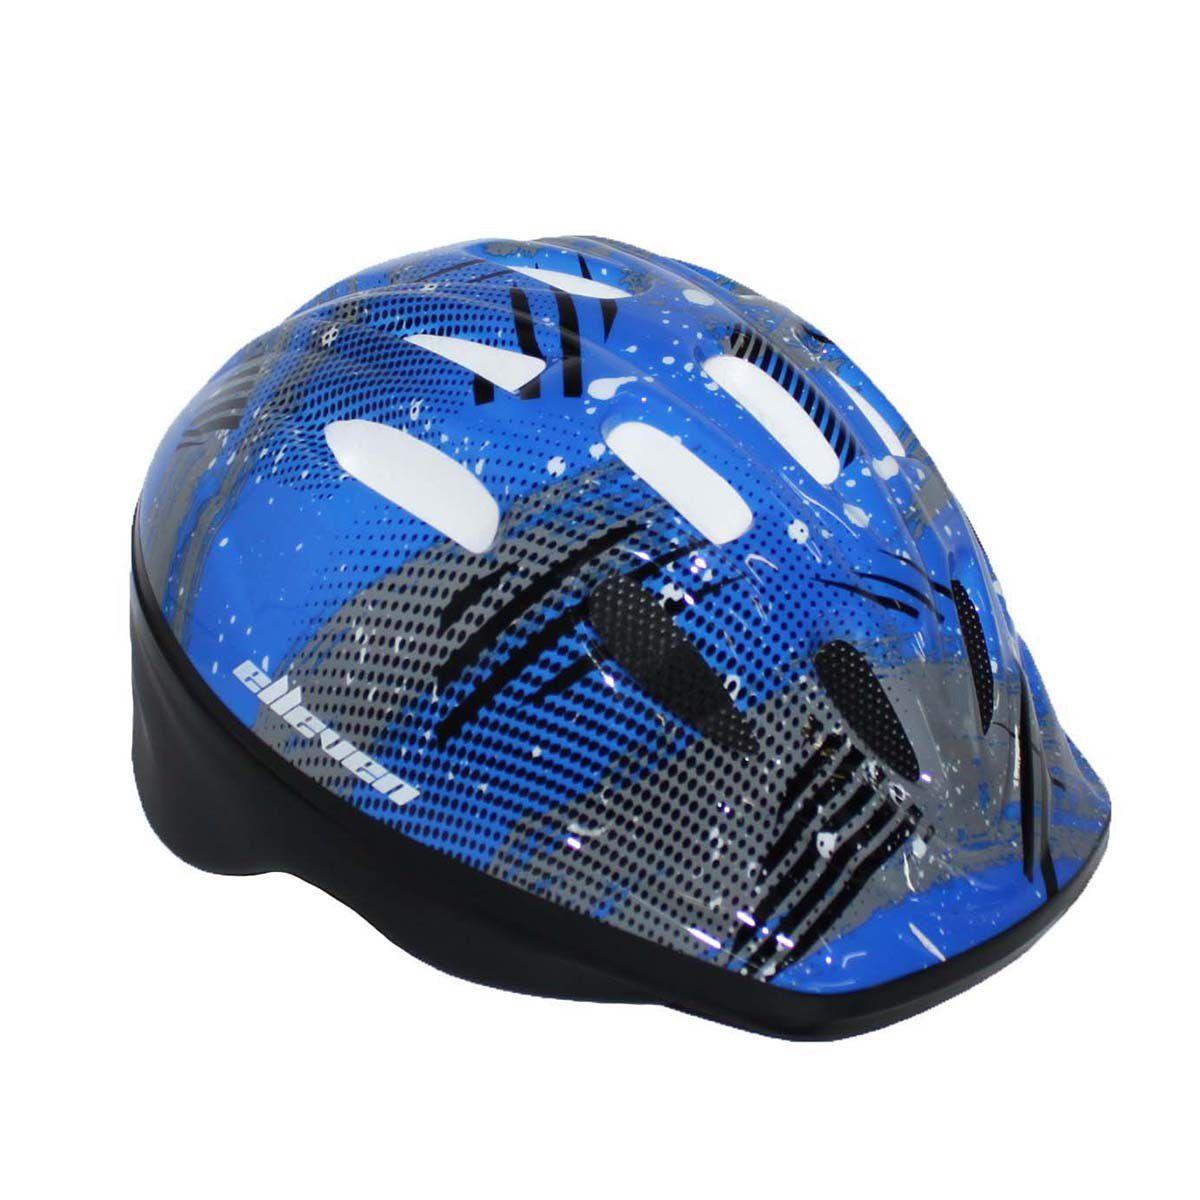 Capacete Infantil Azul Preto Skate Patins Bike